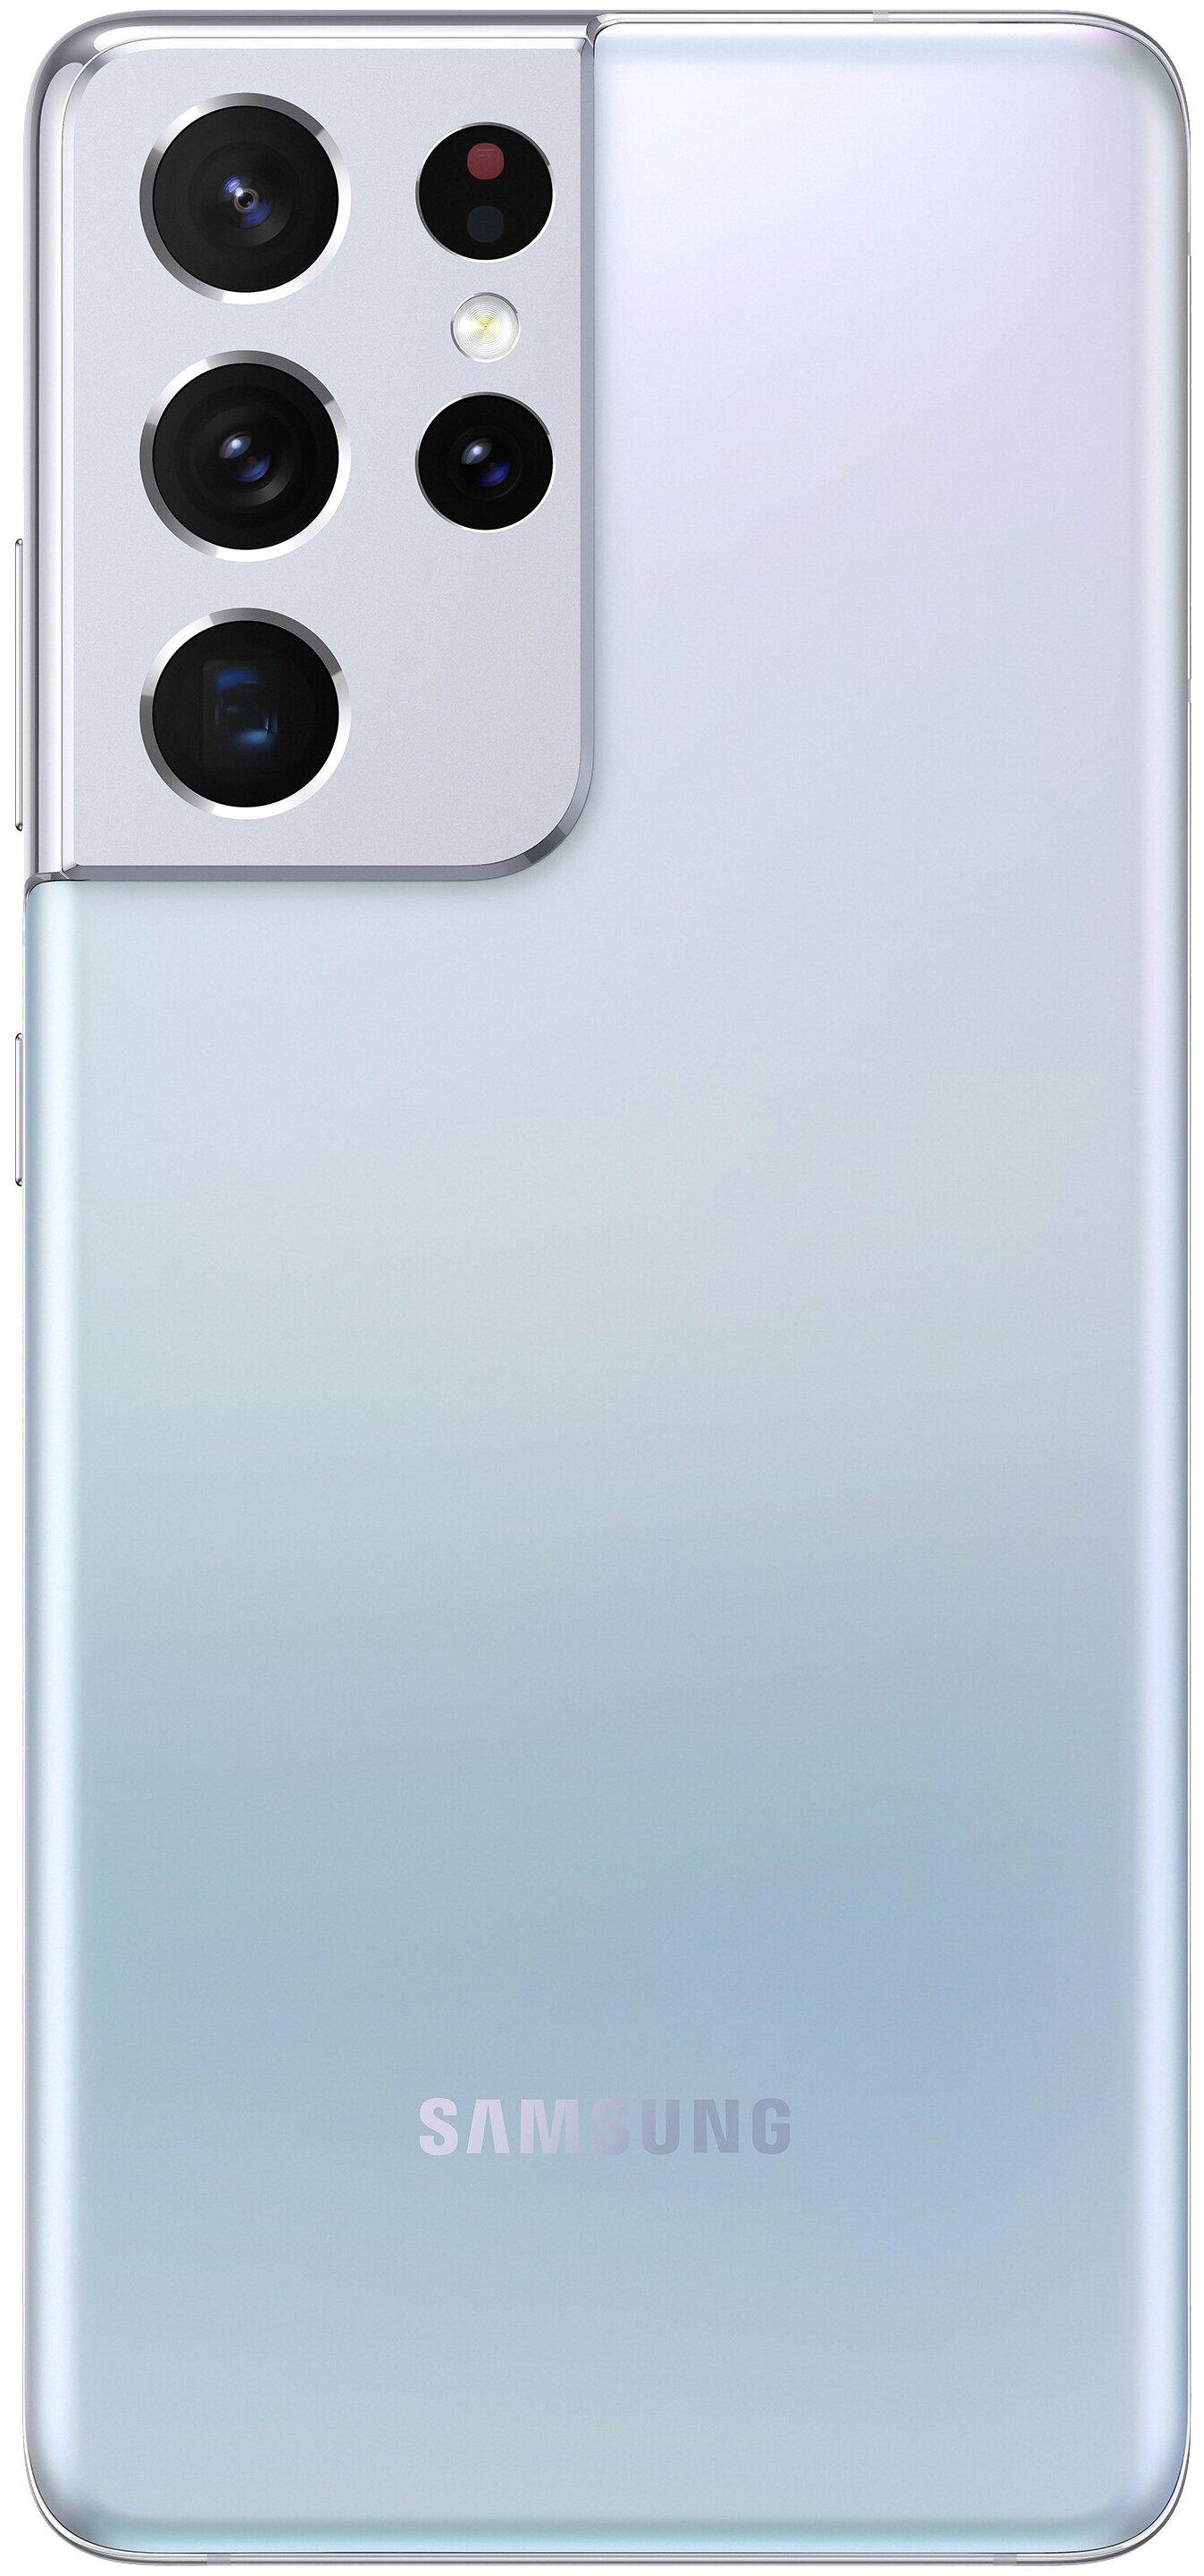 Samsung Galaxy S21 Ultra 5G 16/512GB - вес: 228г